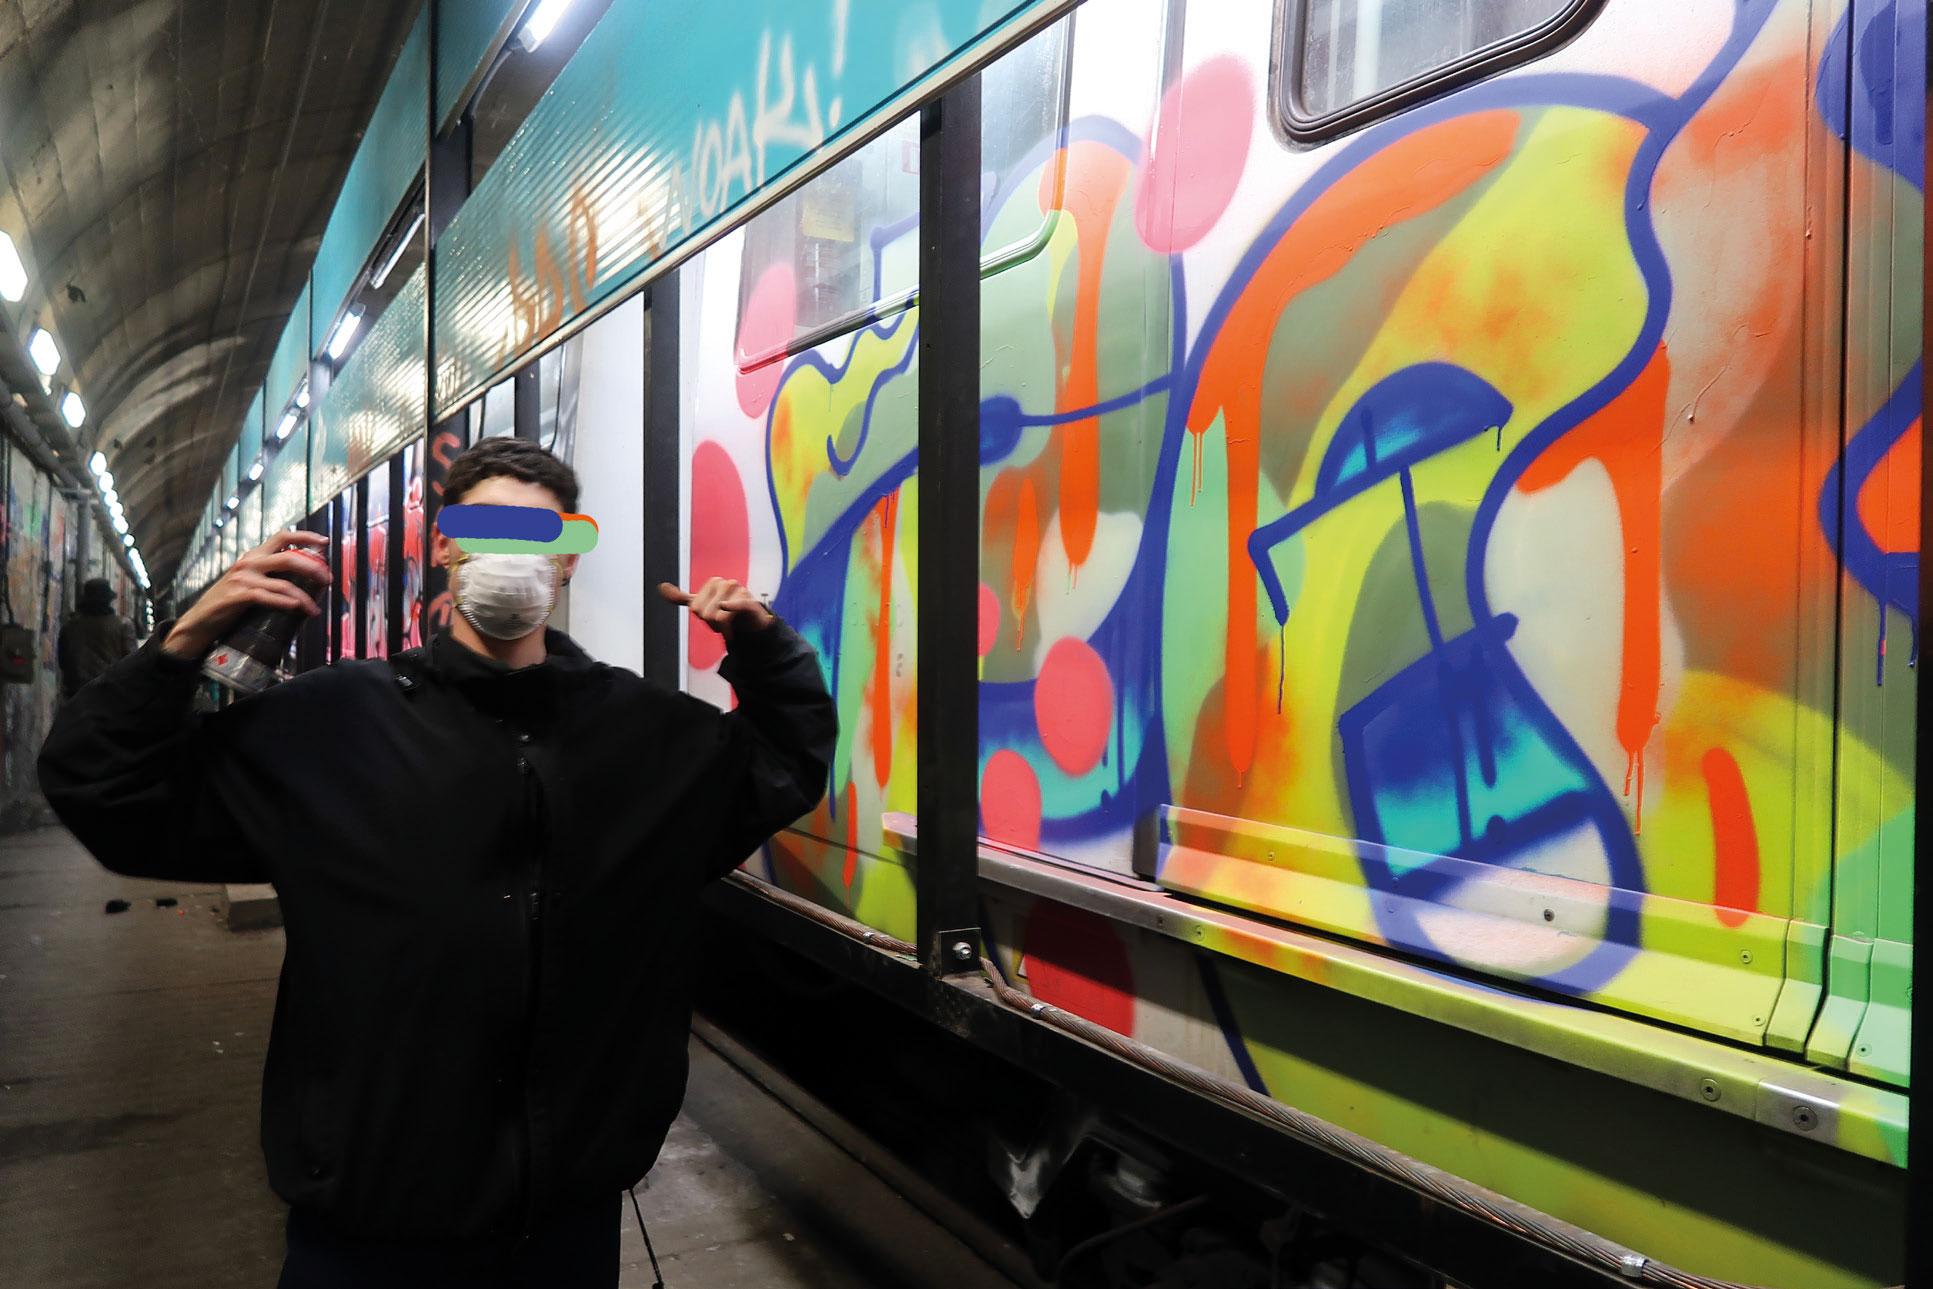 MTTC19 - Nuova fanzine di graffiti